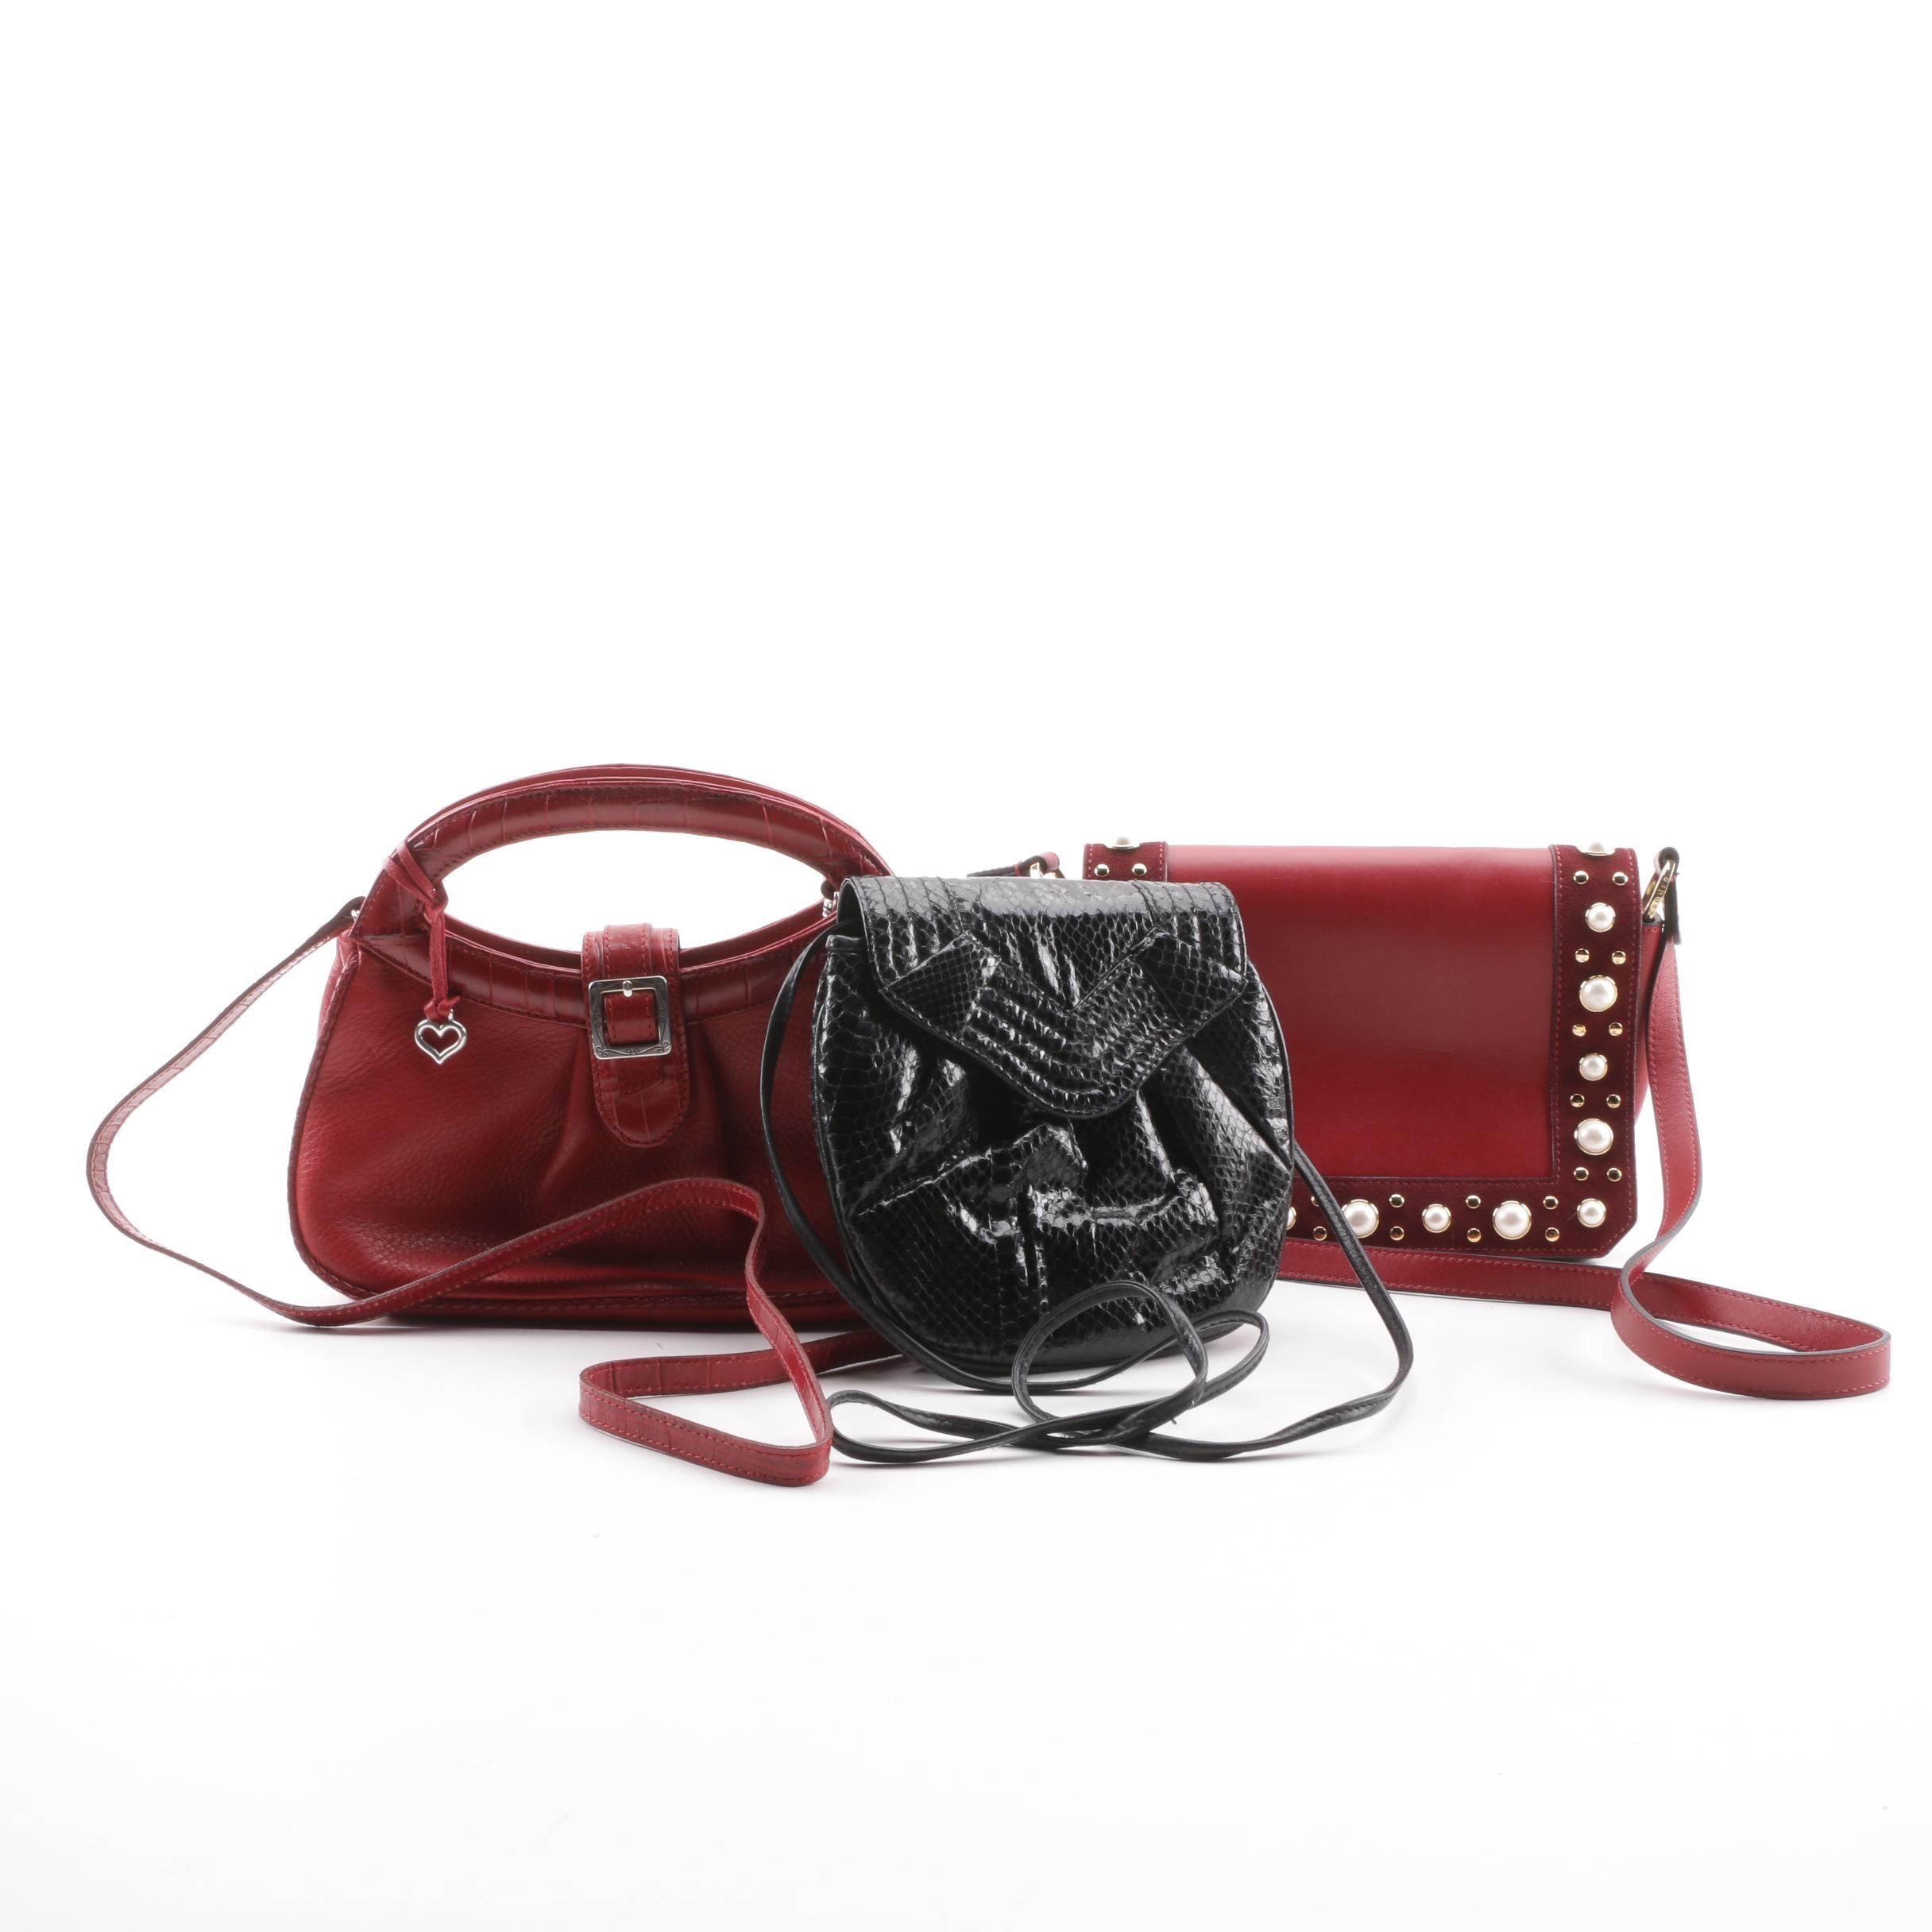 Pantera Snakeskin with Brighton and Sandro Red Leather Handbags